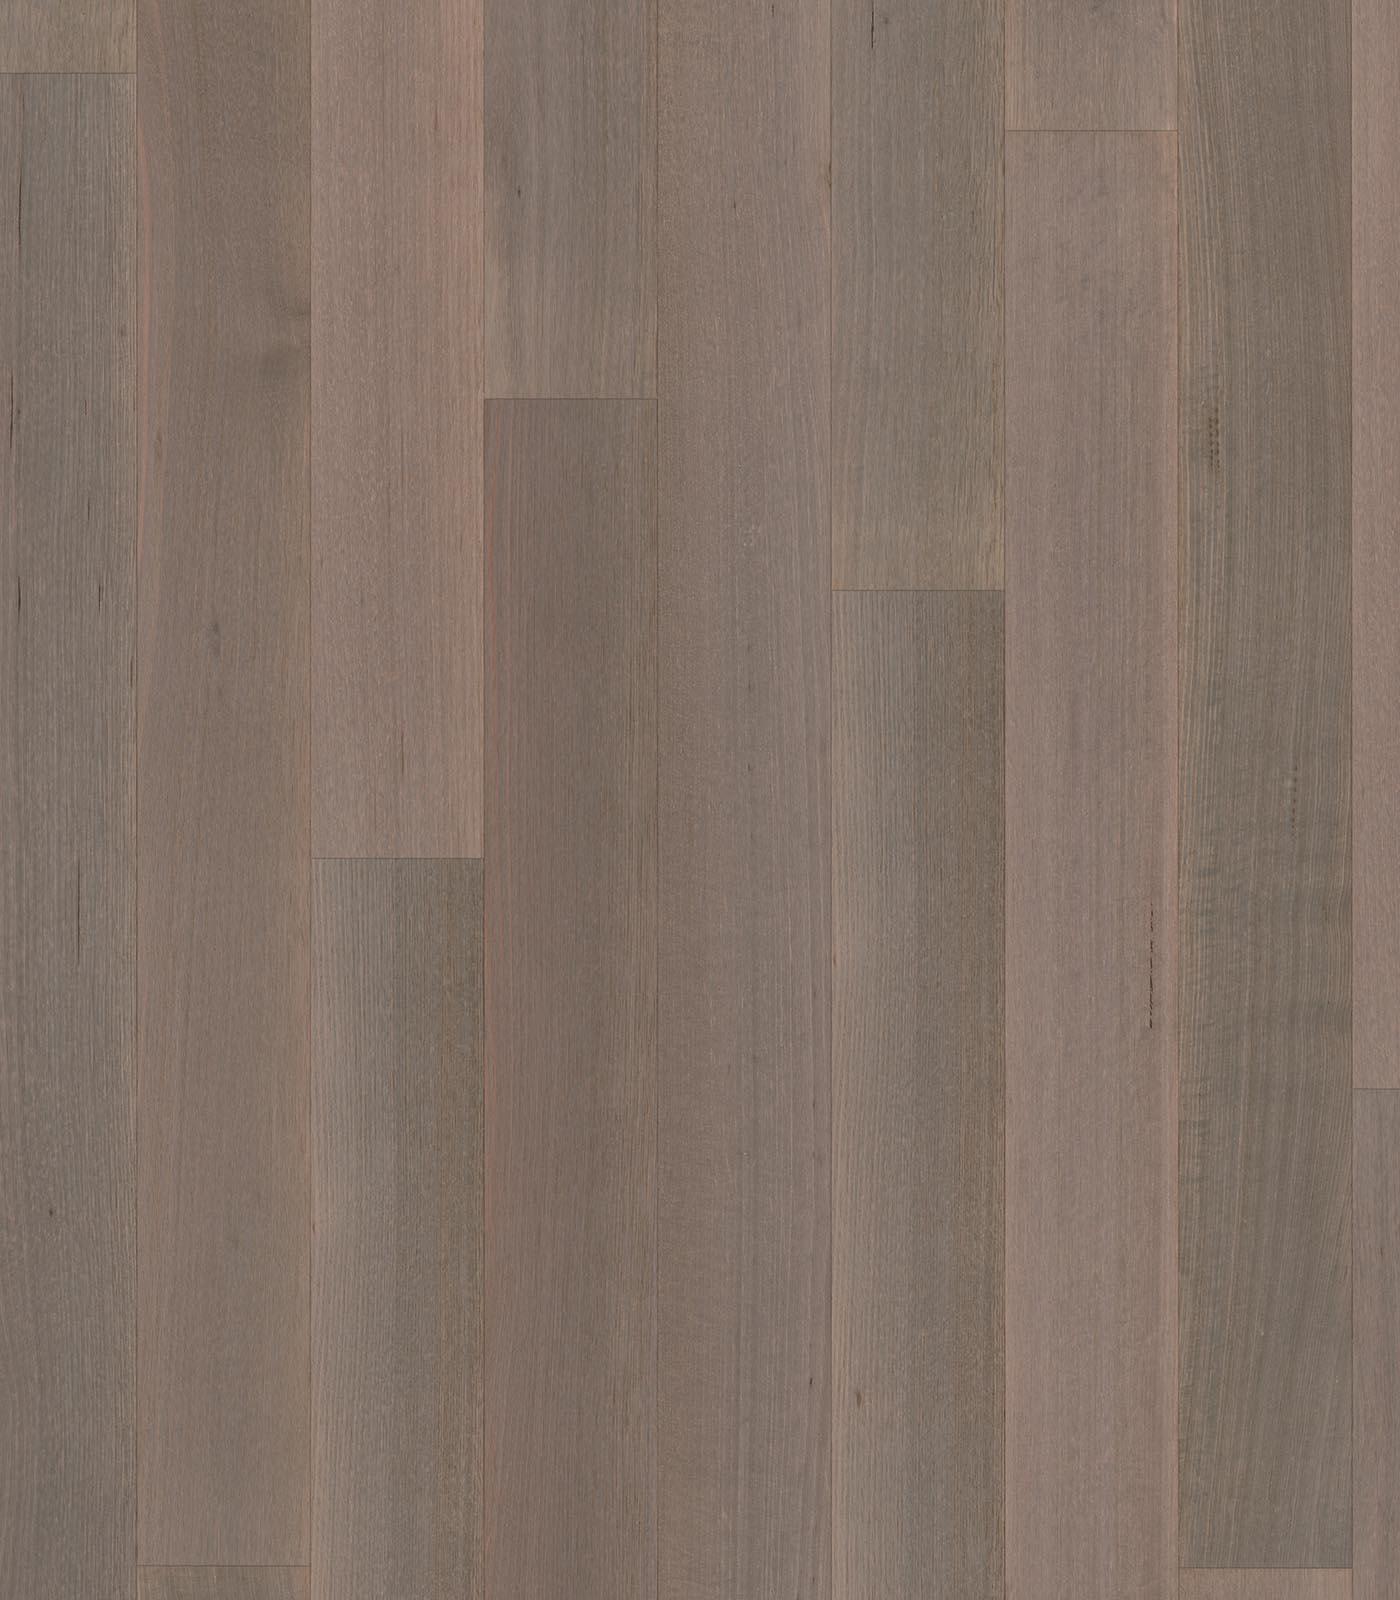 Coffs Harbour-Tasmanian Oak floors-After Oak Collection-flat